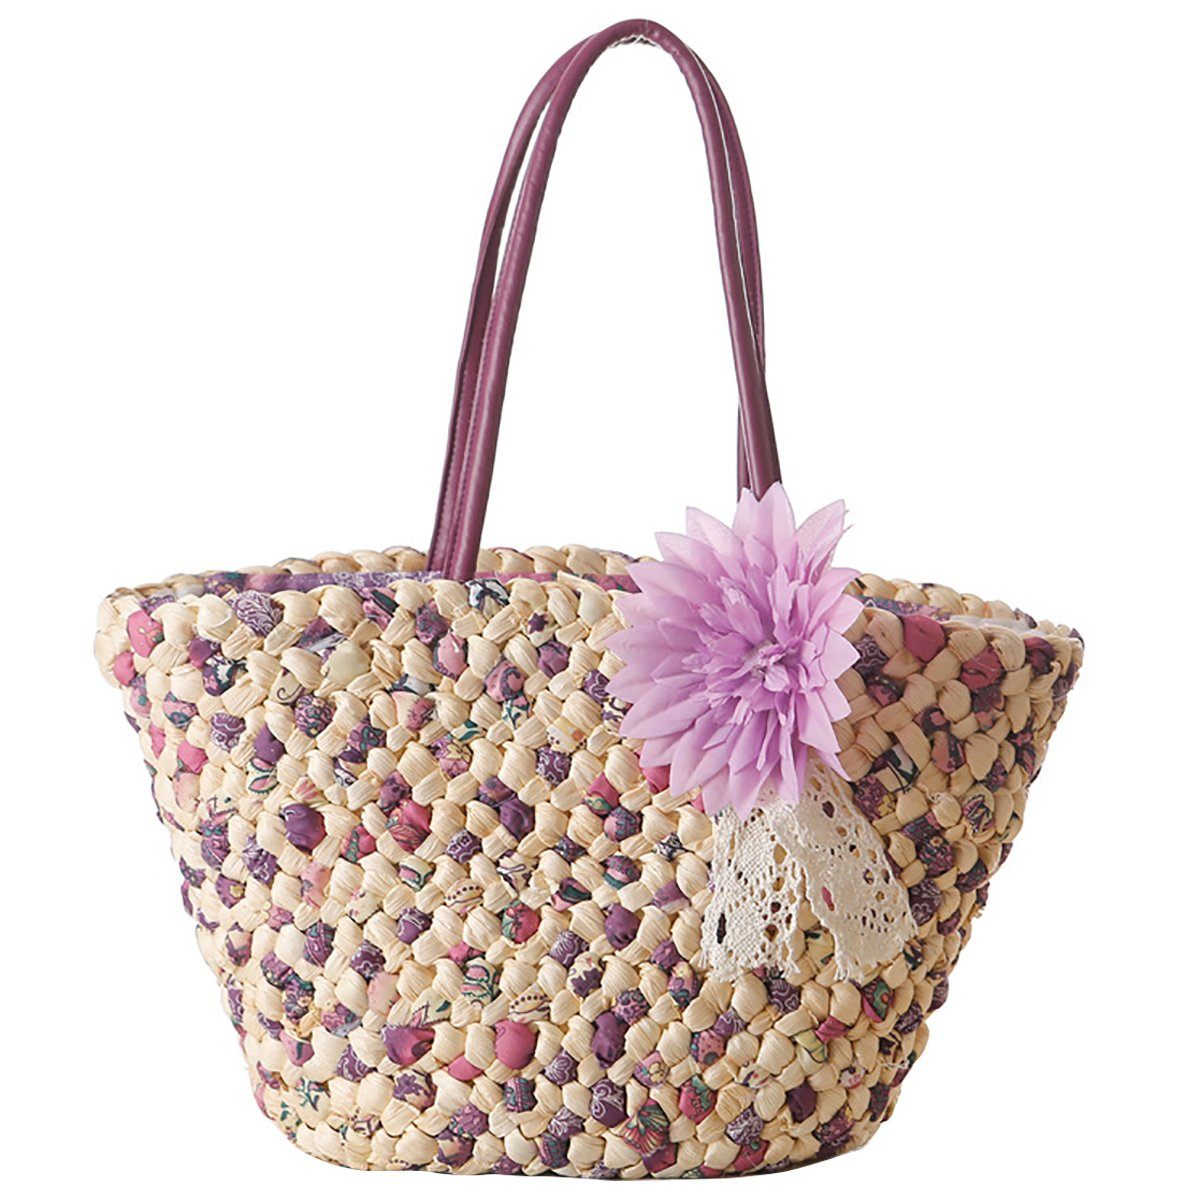 Women Straw Tote, JOSEKO Summer Beach Bag with Inner Pocket Flower Bag Shoulder Bag for Ladies Purple 17.71''/9.44''x 5.91''x 9.84''(LxWxH)